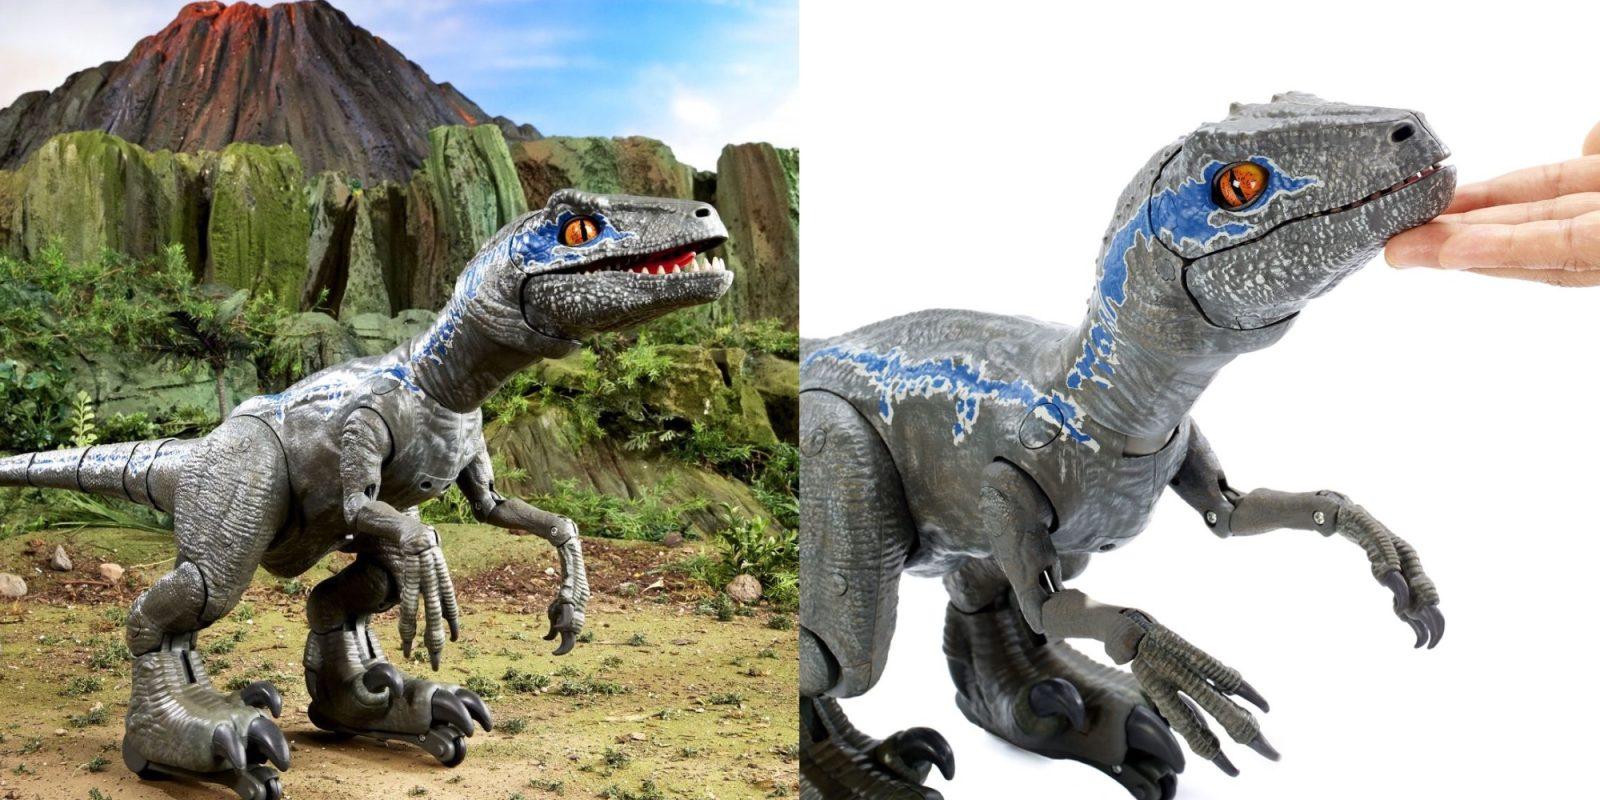 Train your own velociraptor w/ this $80 Jurassic World Robotic Dino ($50 off)